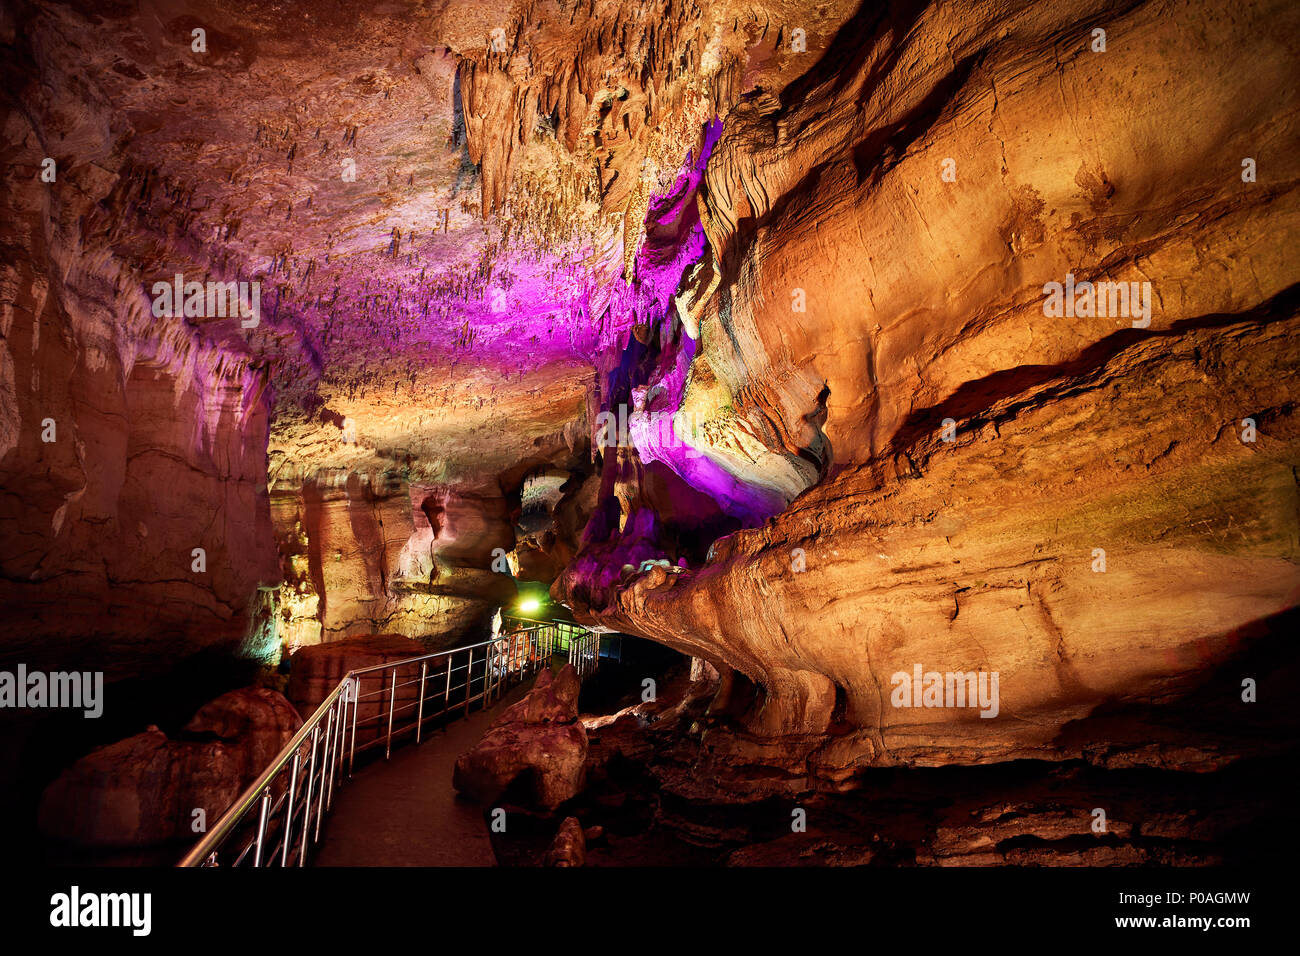 Underground cave Sataplia with colorful illumination in Kutaisi, Georgia - Stock Image